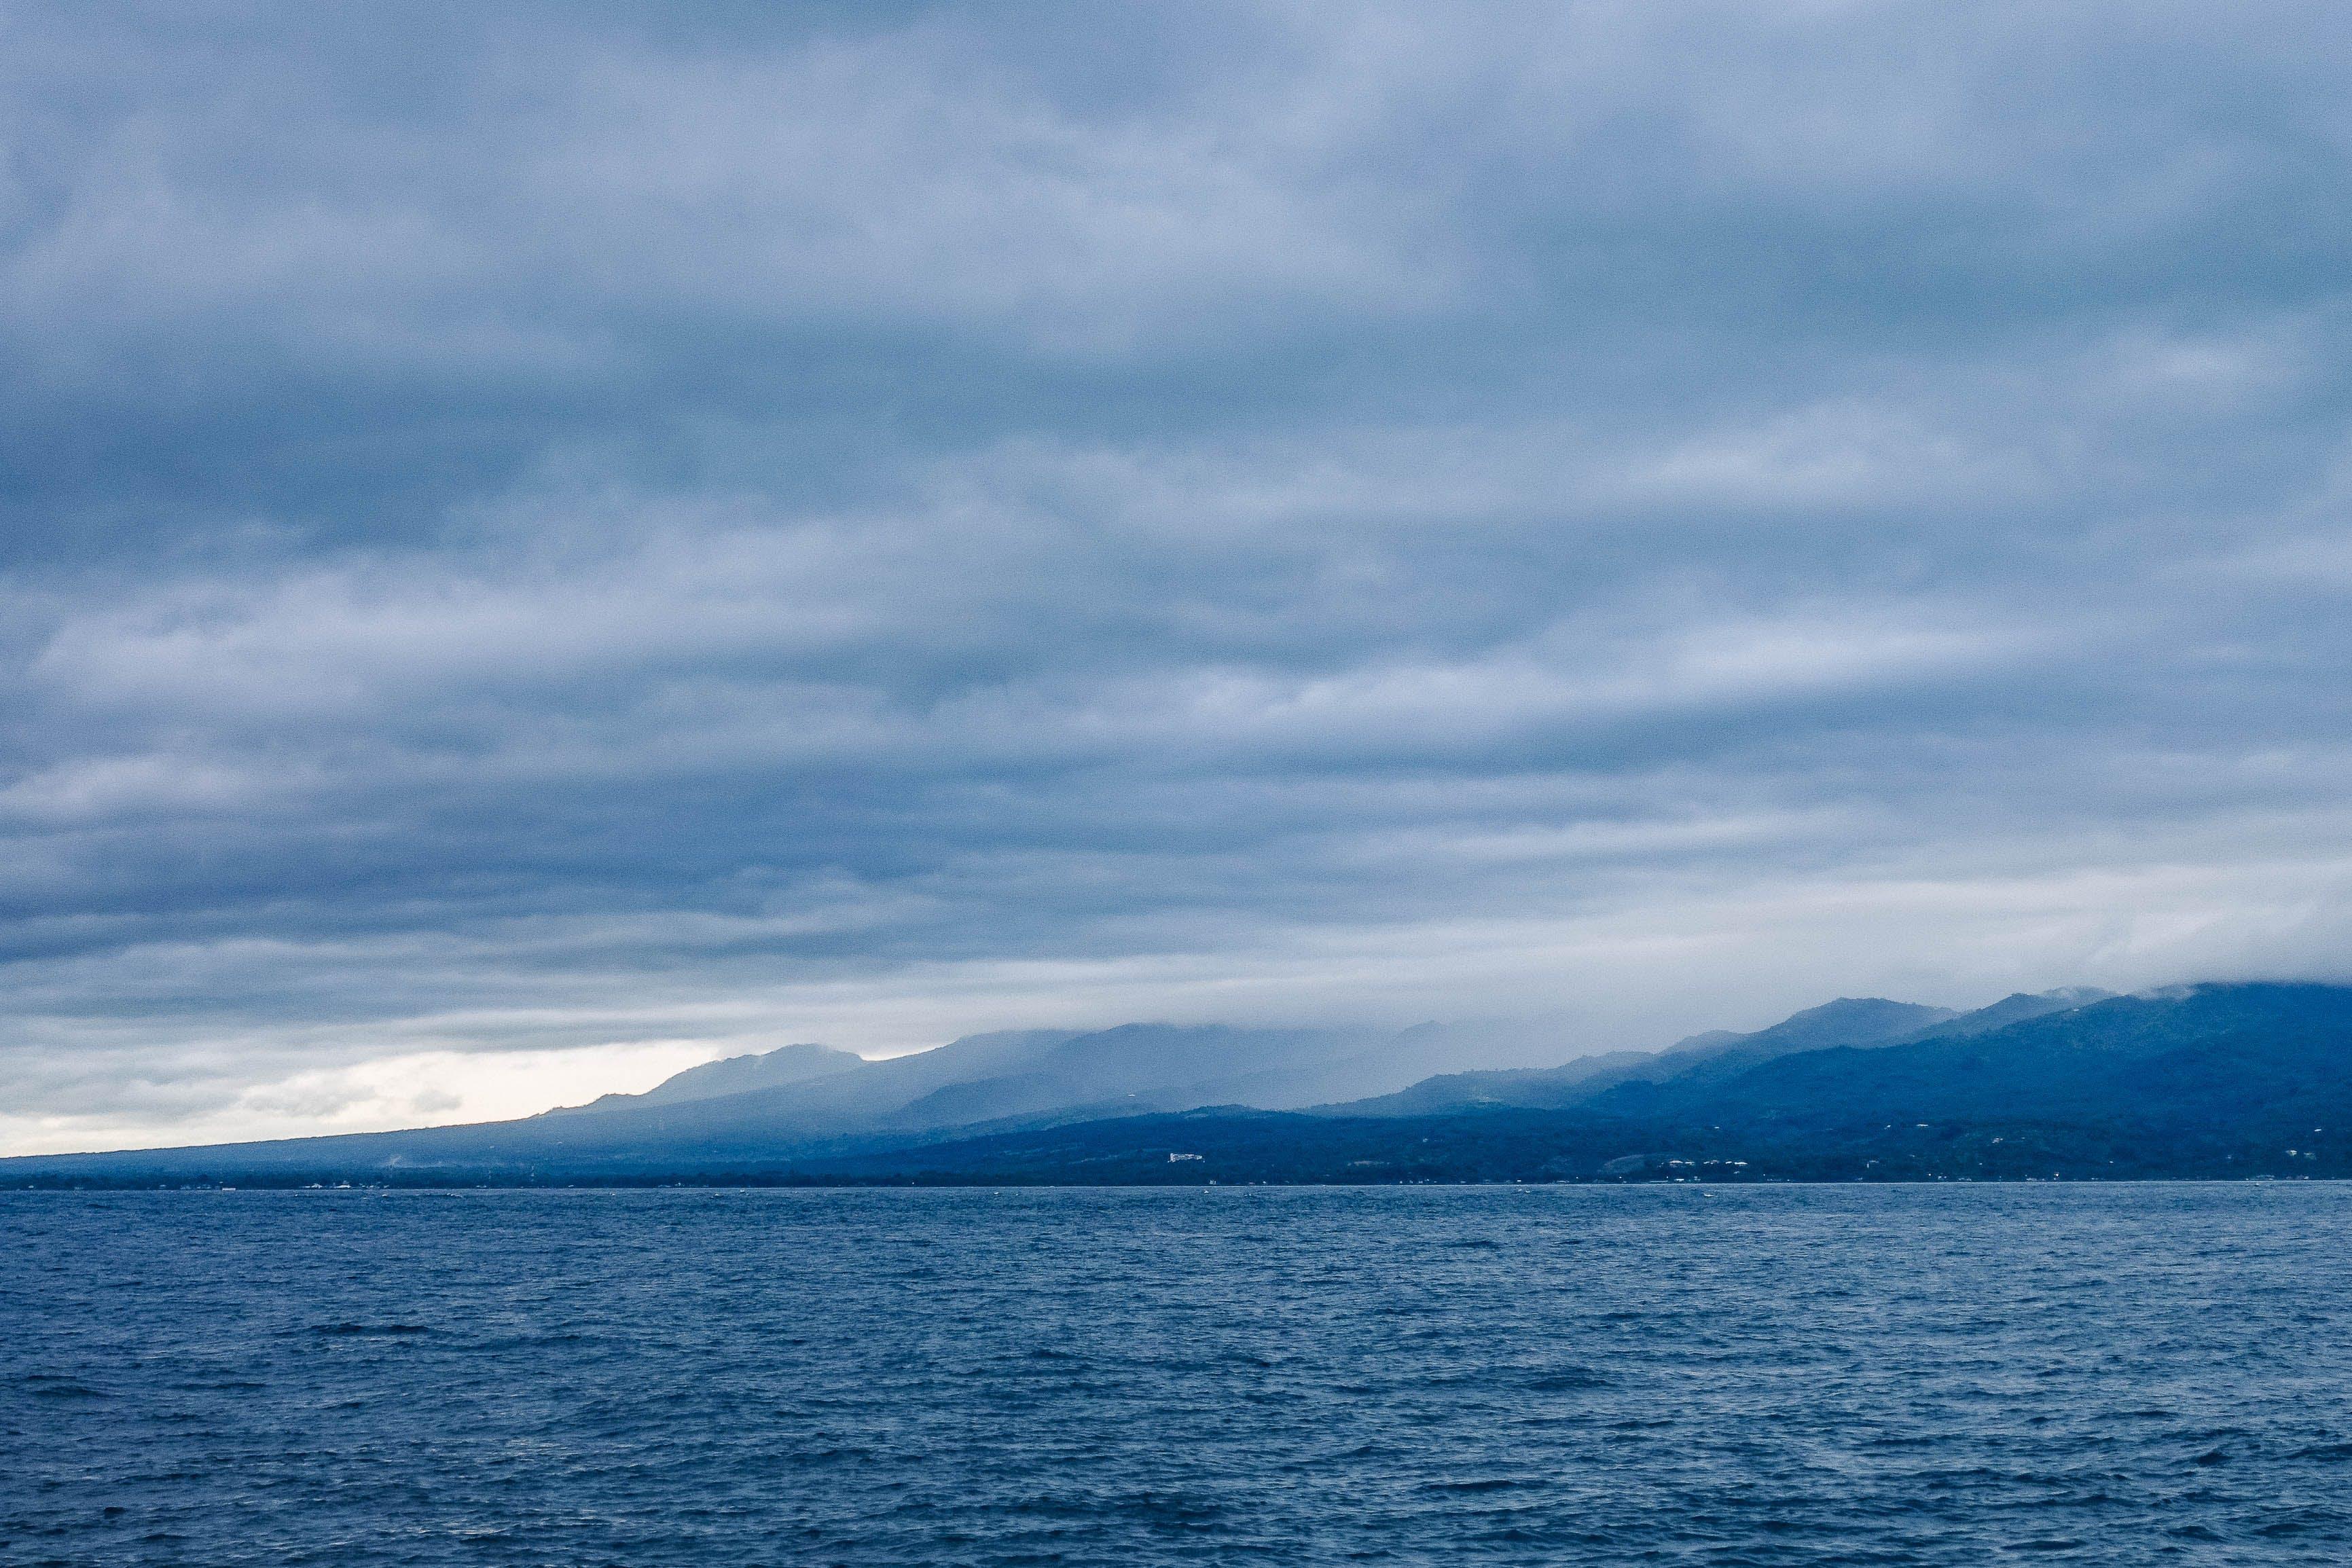 Island Across Body of Water Under Cloudy Sky